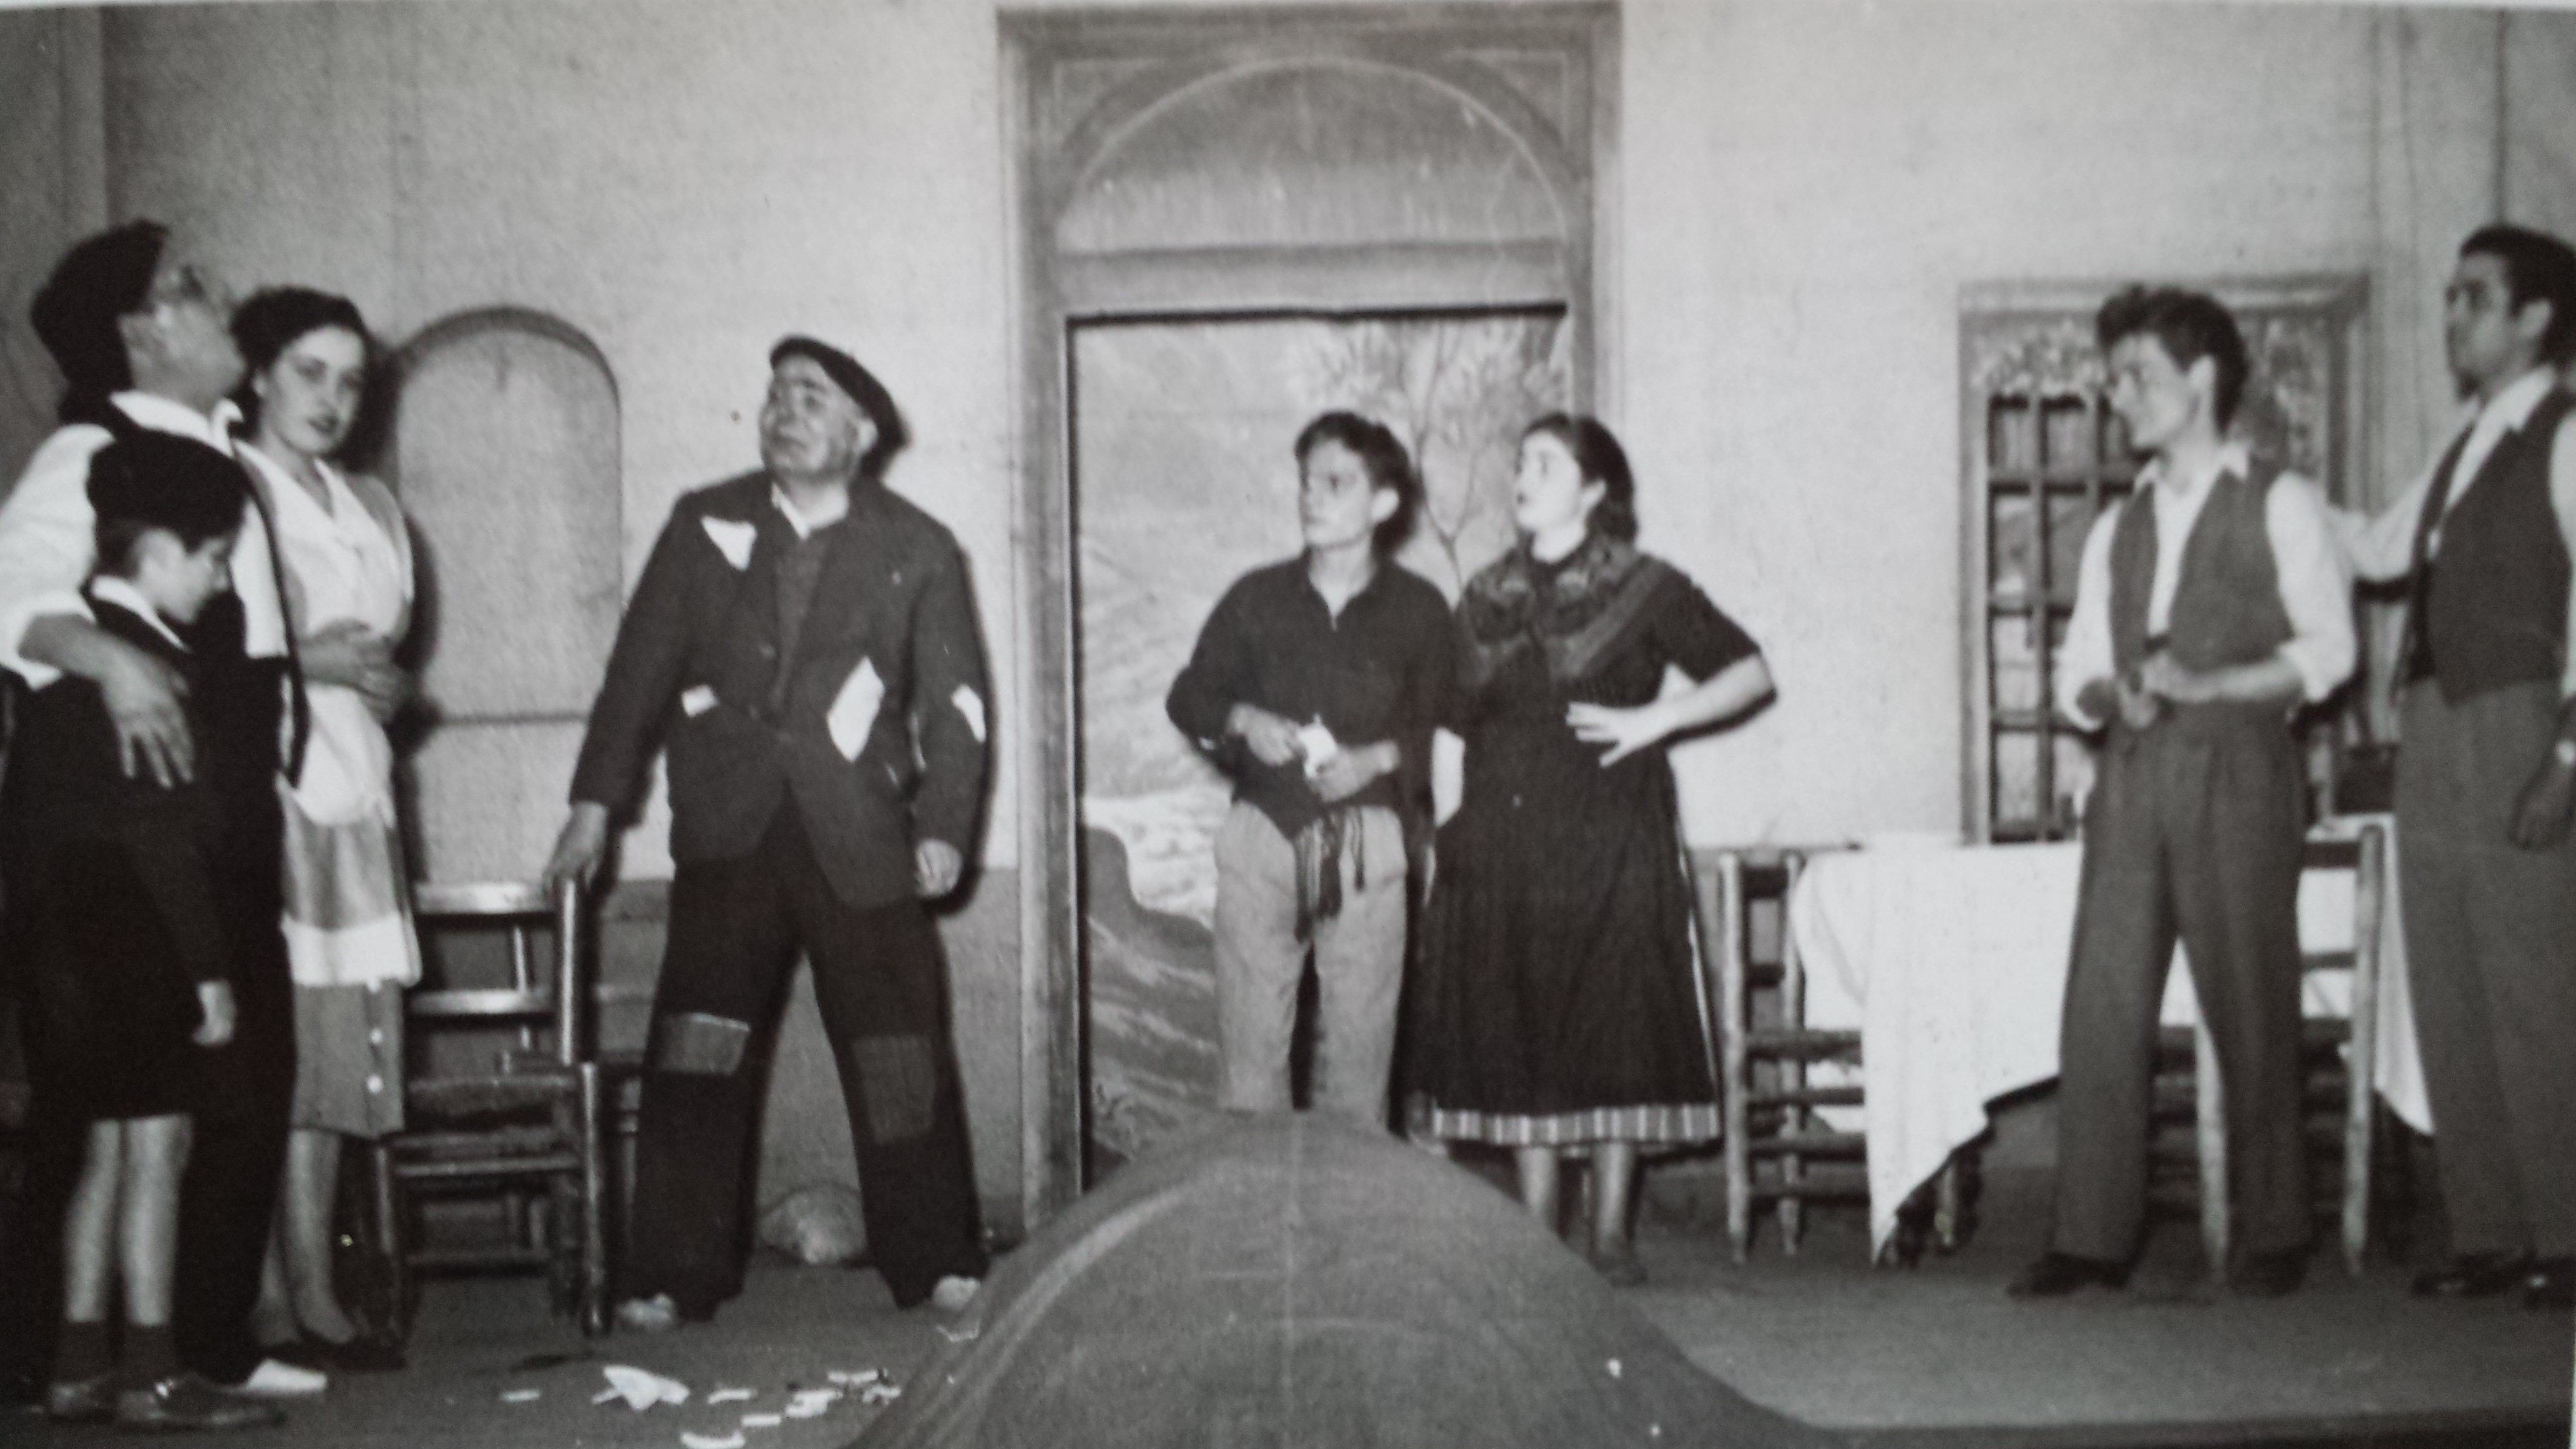 Lley de vida 1953